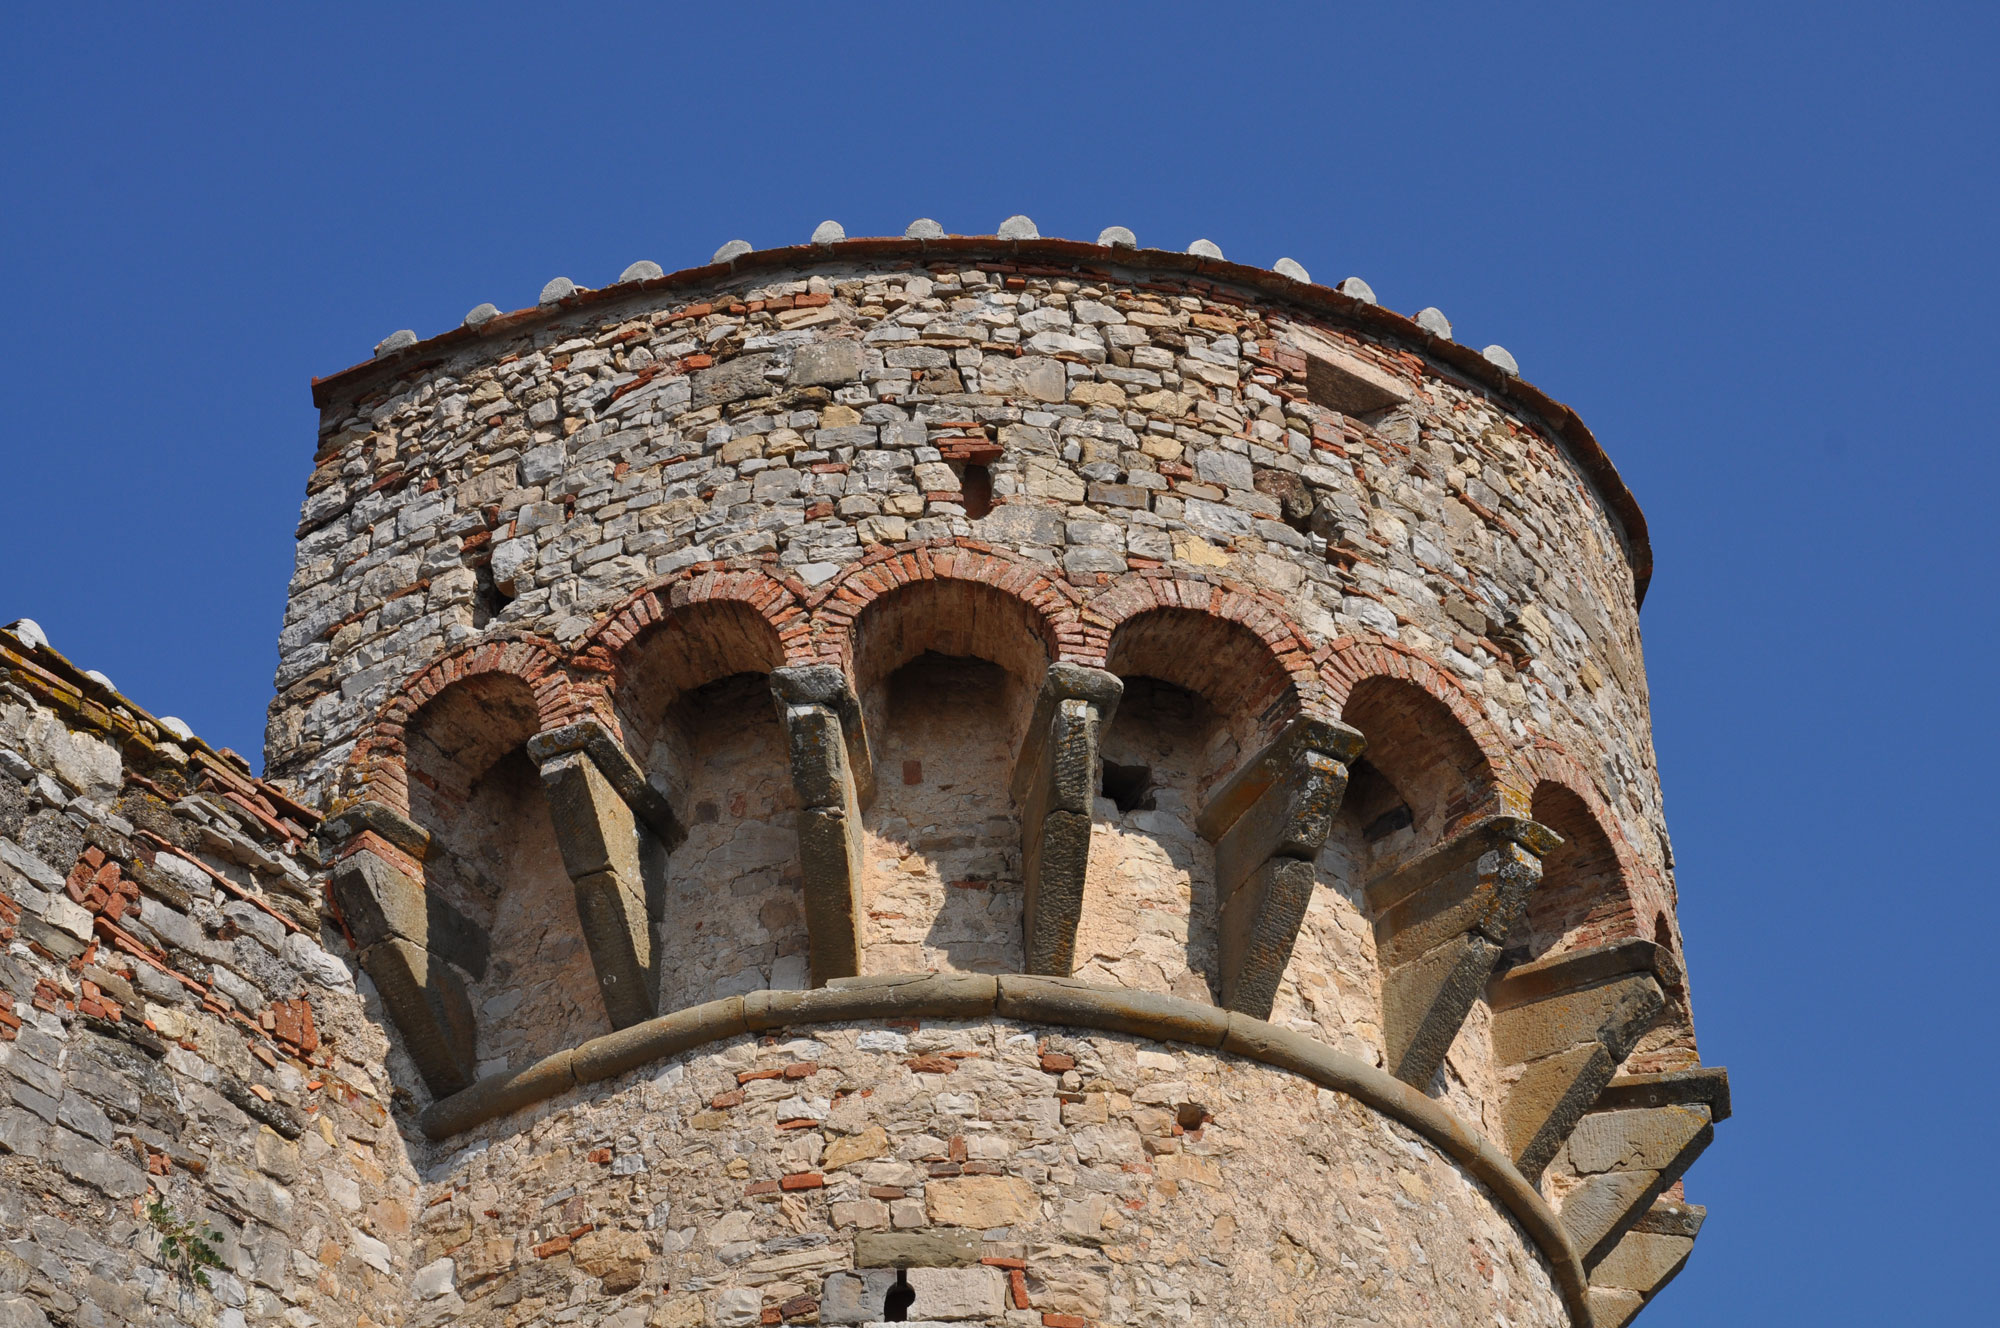 Castelli e vino: i piu' bei castelli-fattorie del Chianti senese